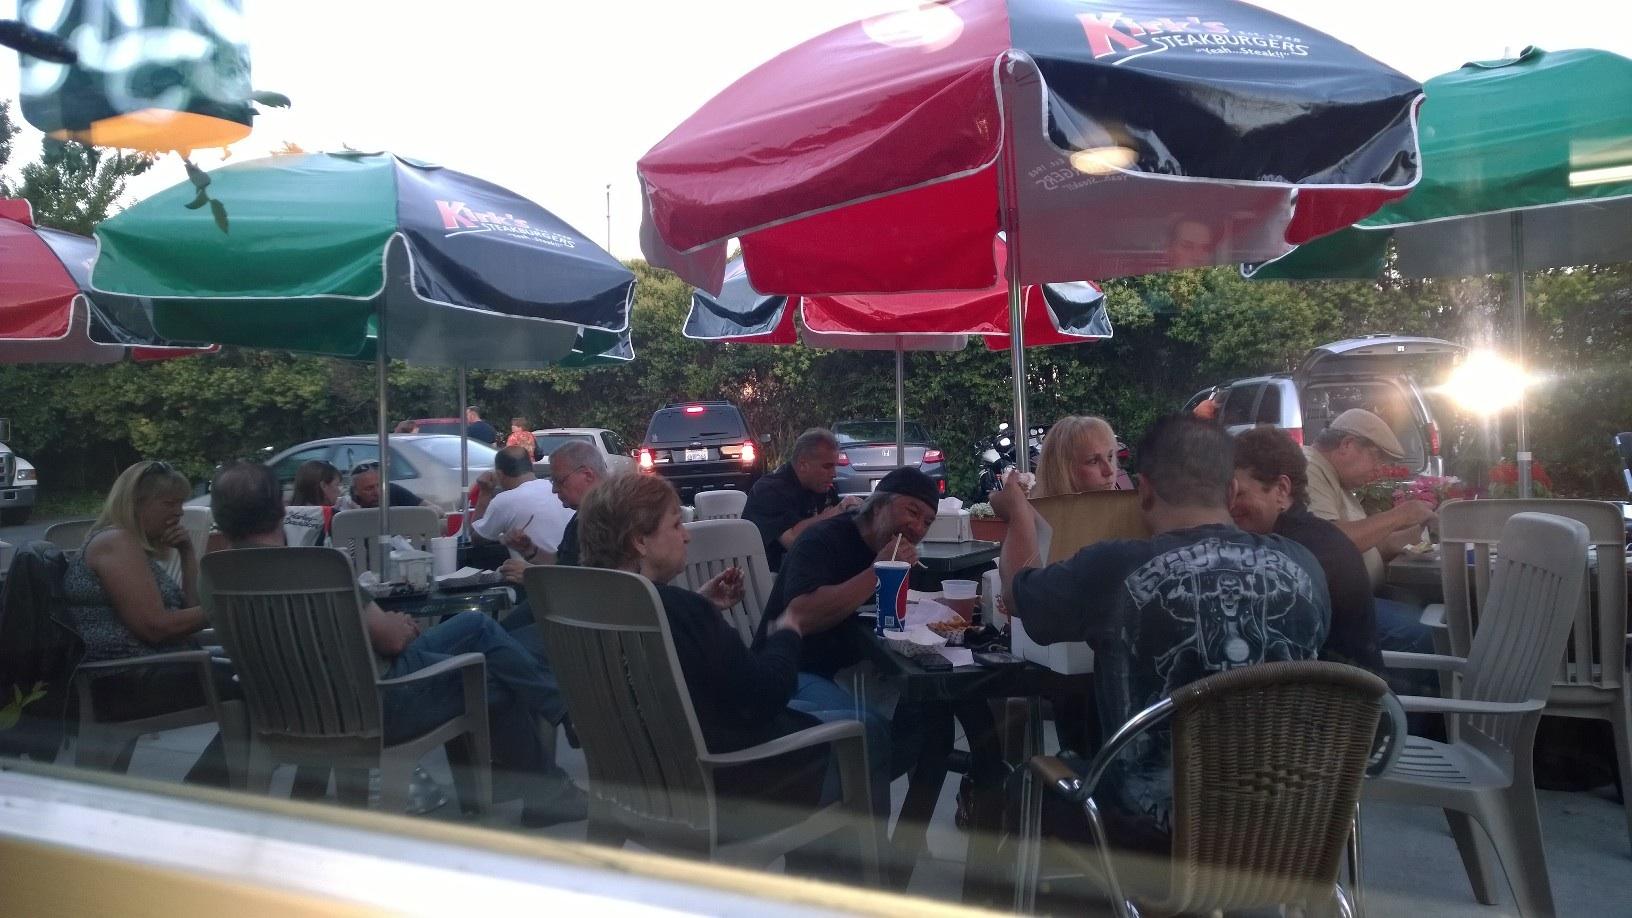 Kirks Steakburgers - Campbell, CA